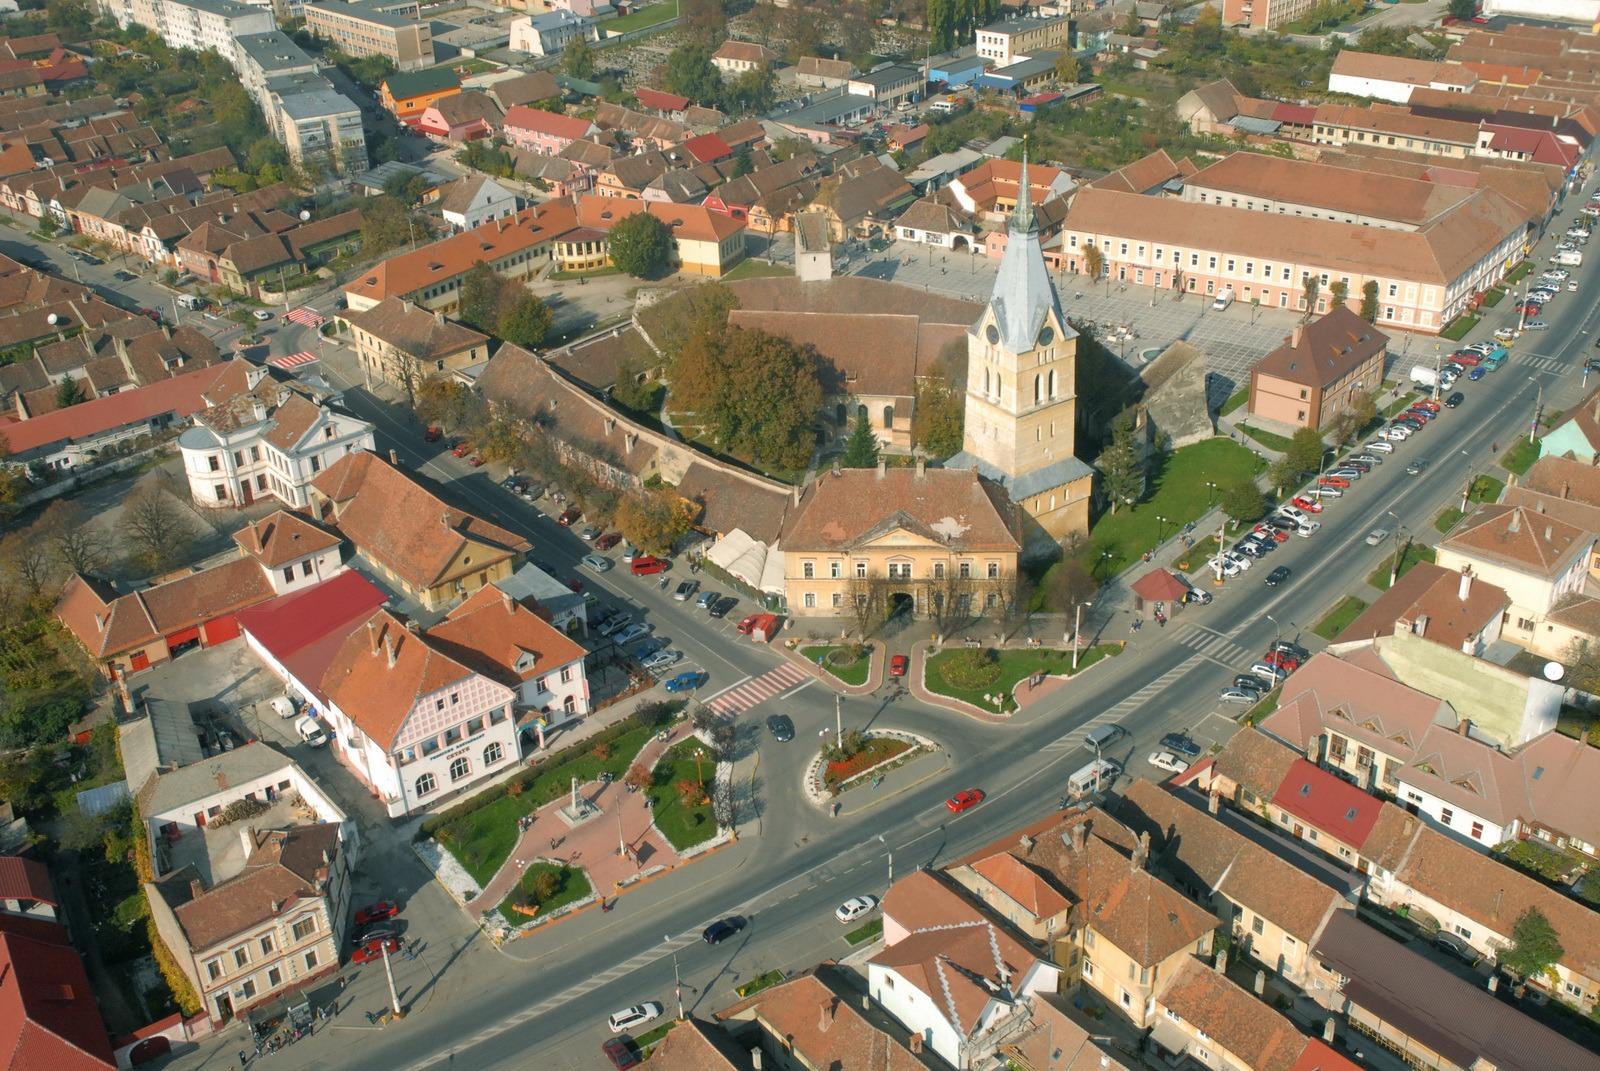 FOTO: scoala3codlea.ro